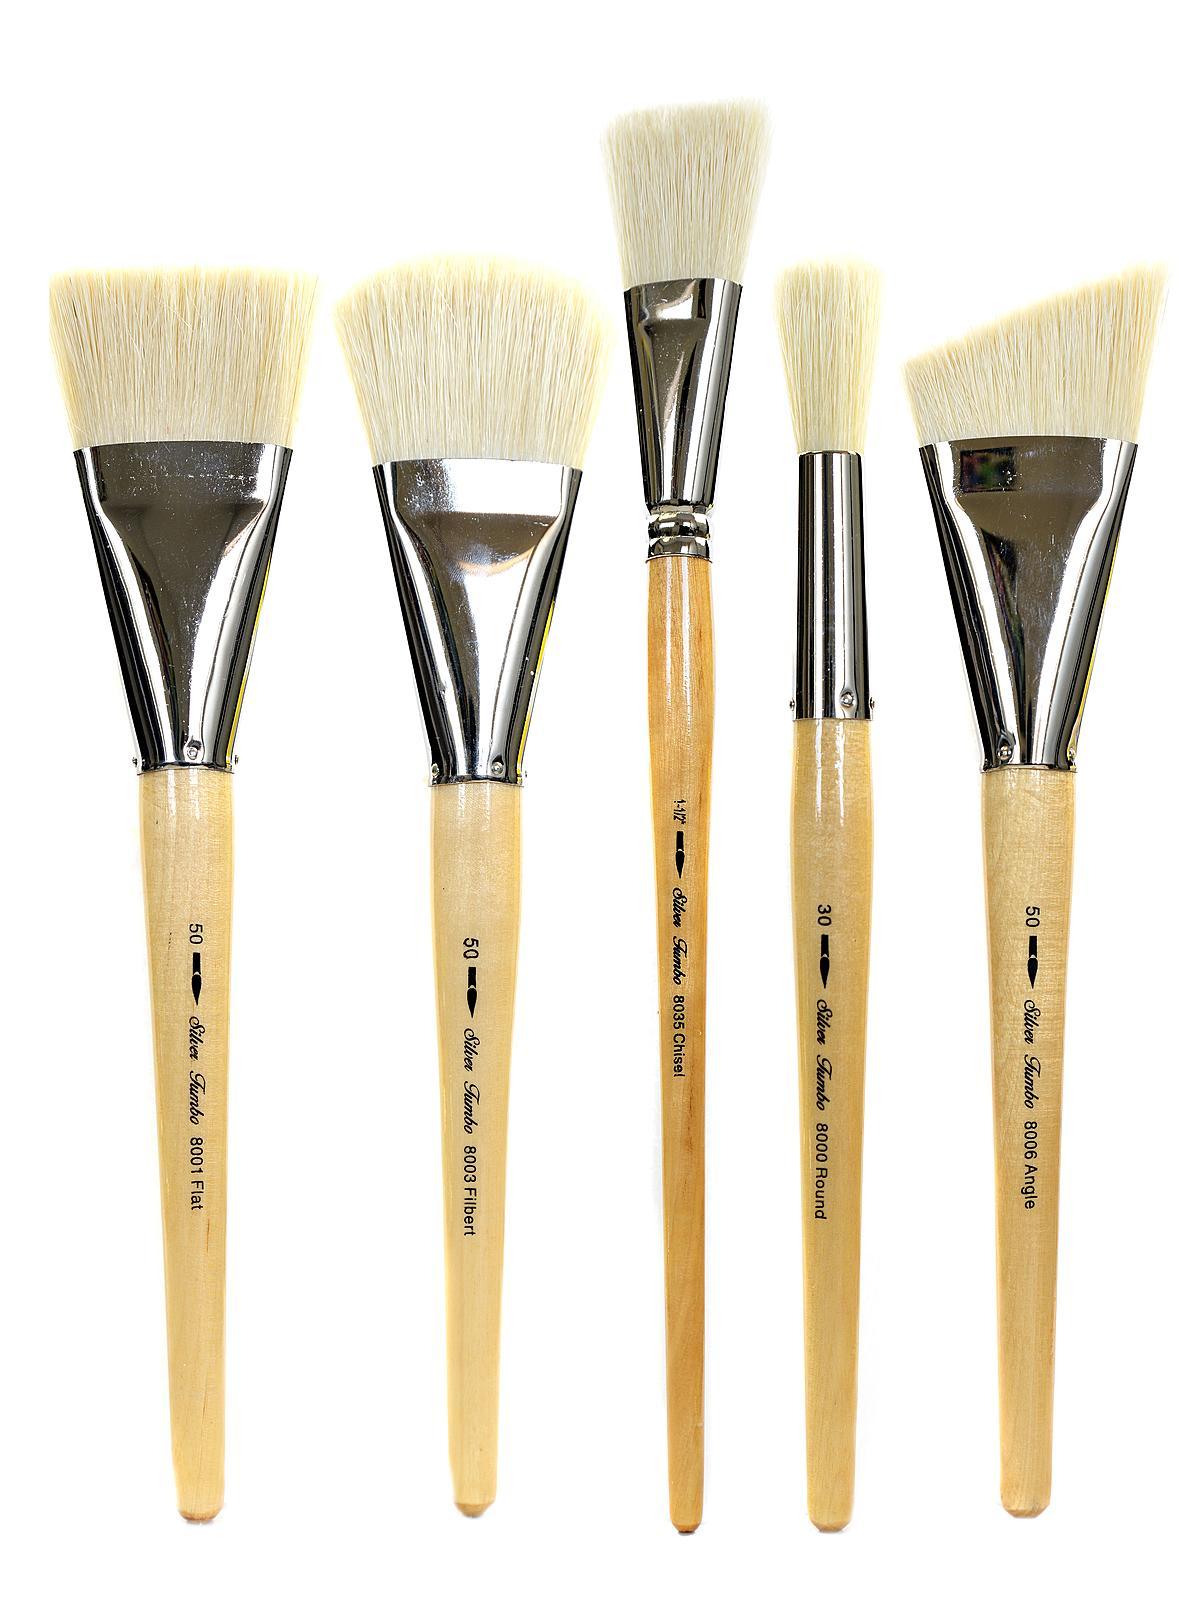 Silver Brush - Silver Jumbo Brushes